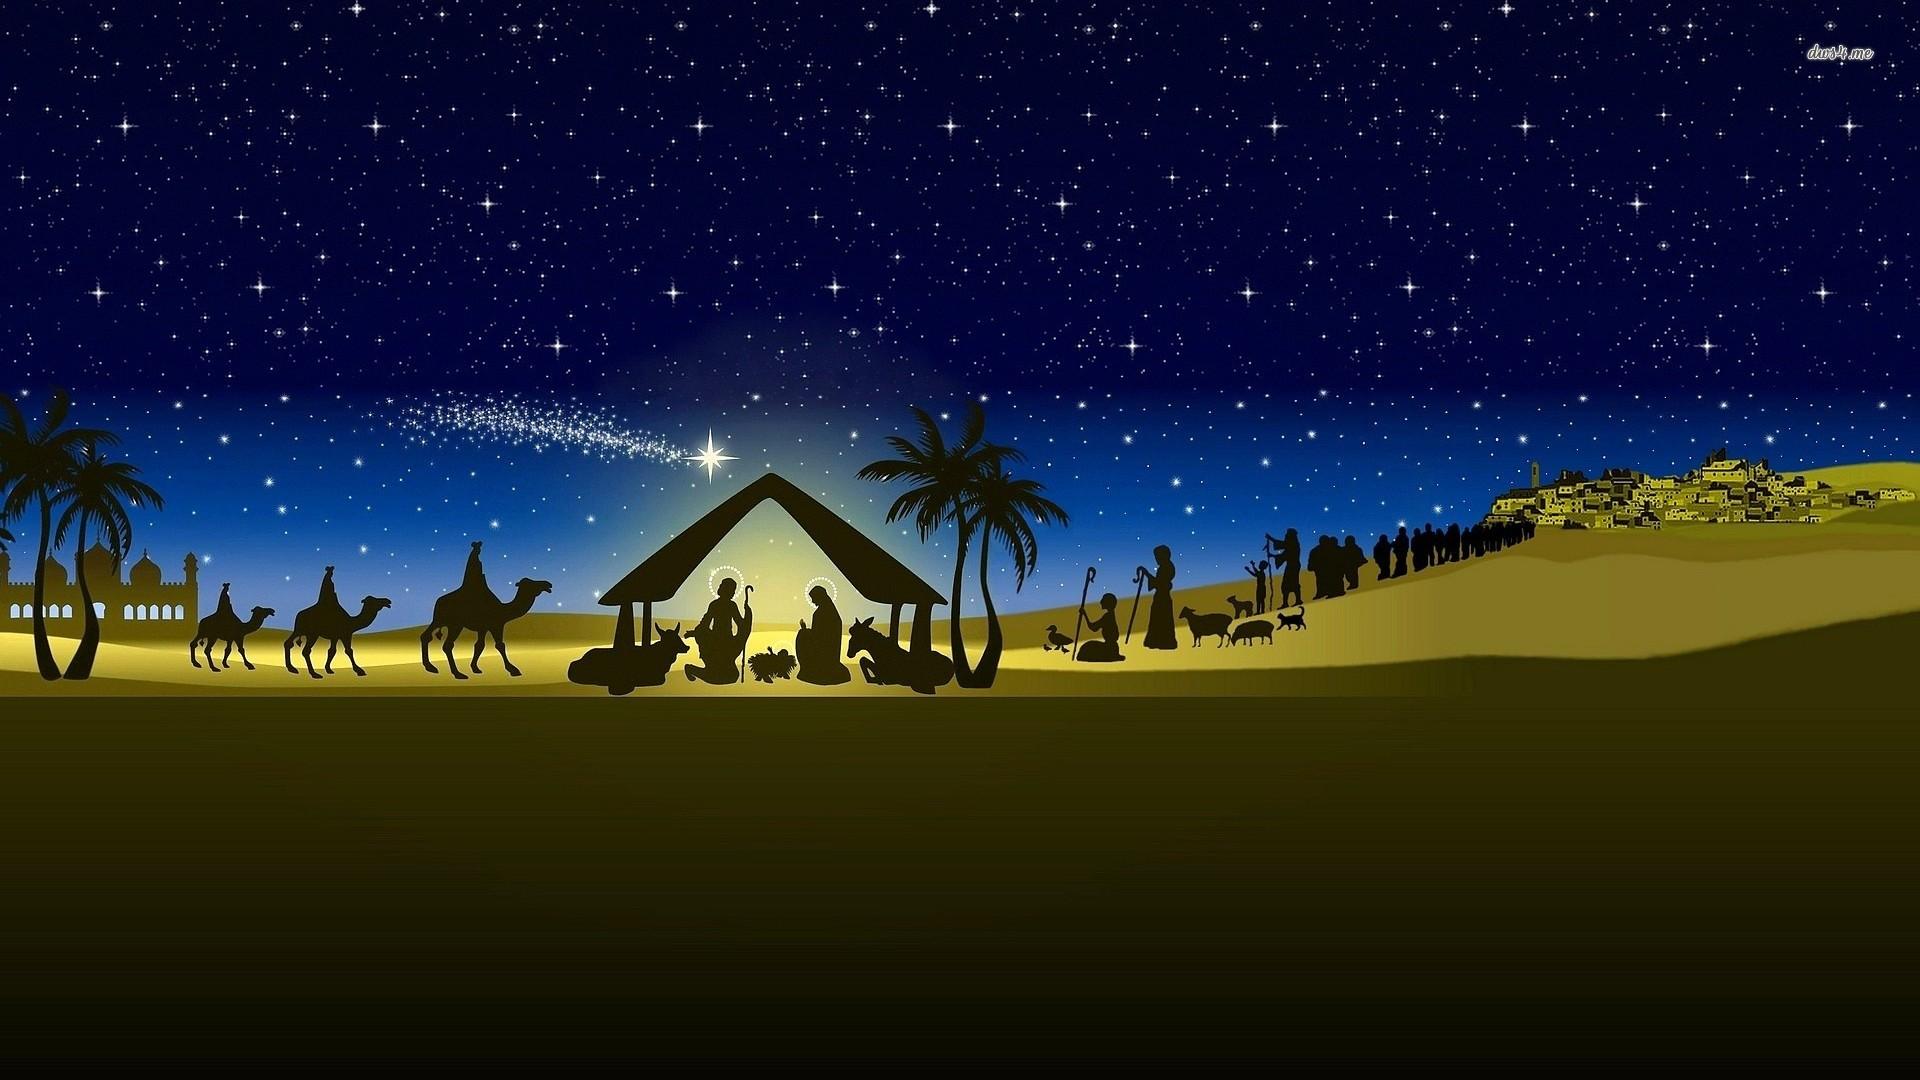 13205-nativity-scene-1920x1080-holiday-wallpaper.jpg